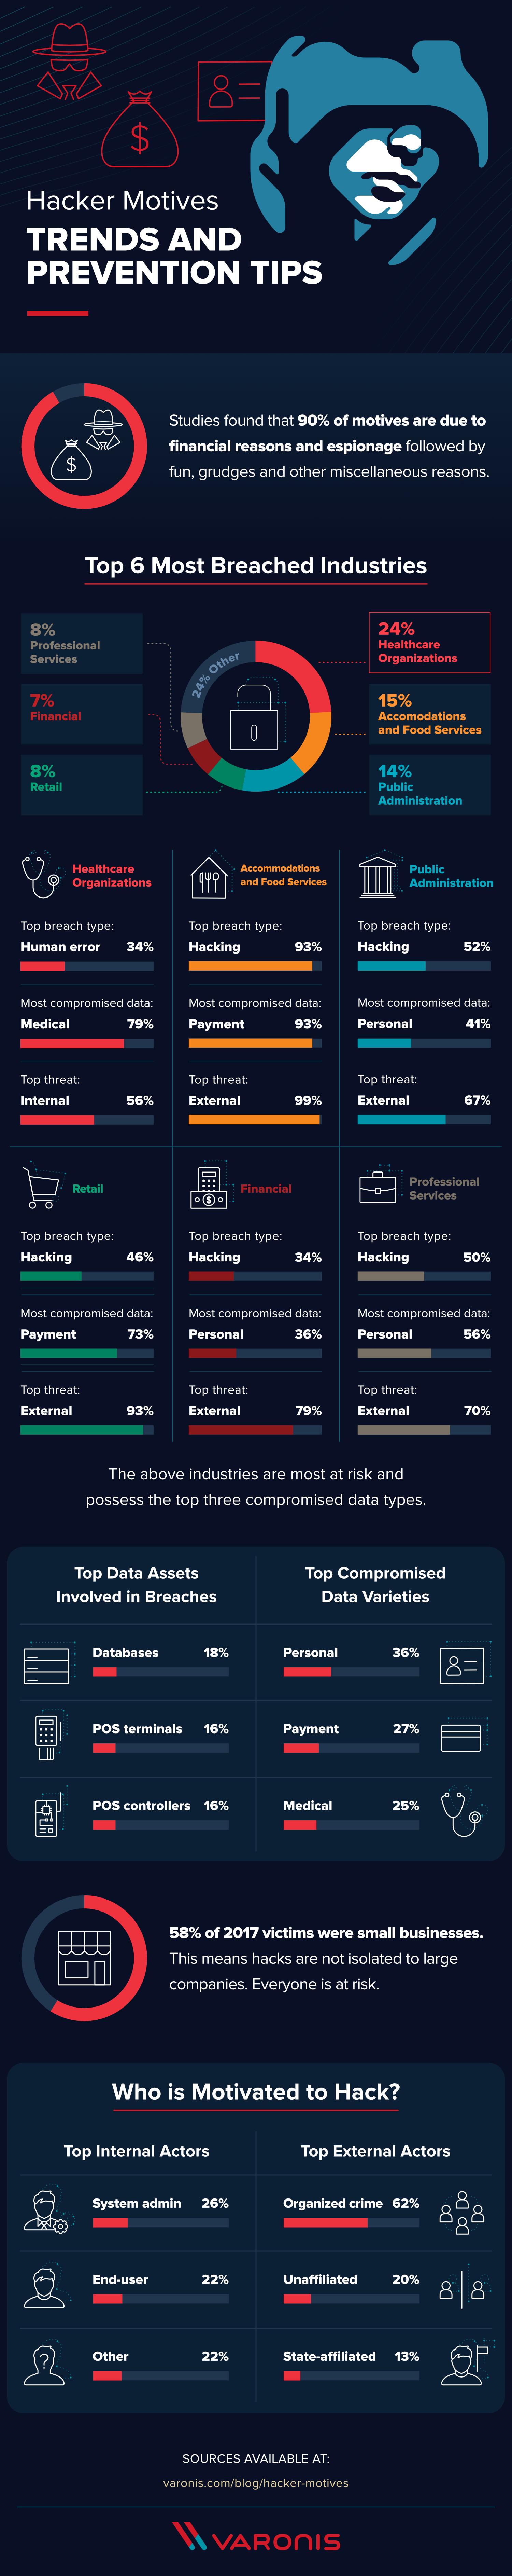 Understanding Hacker Motives for Effective Prevention - Infographic